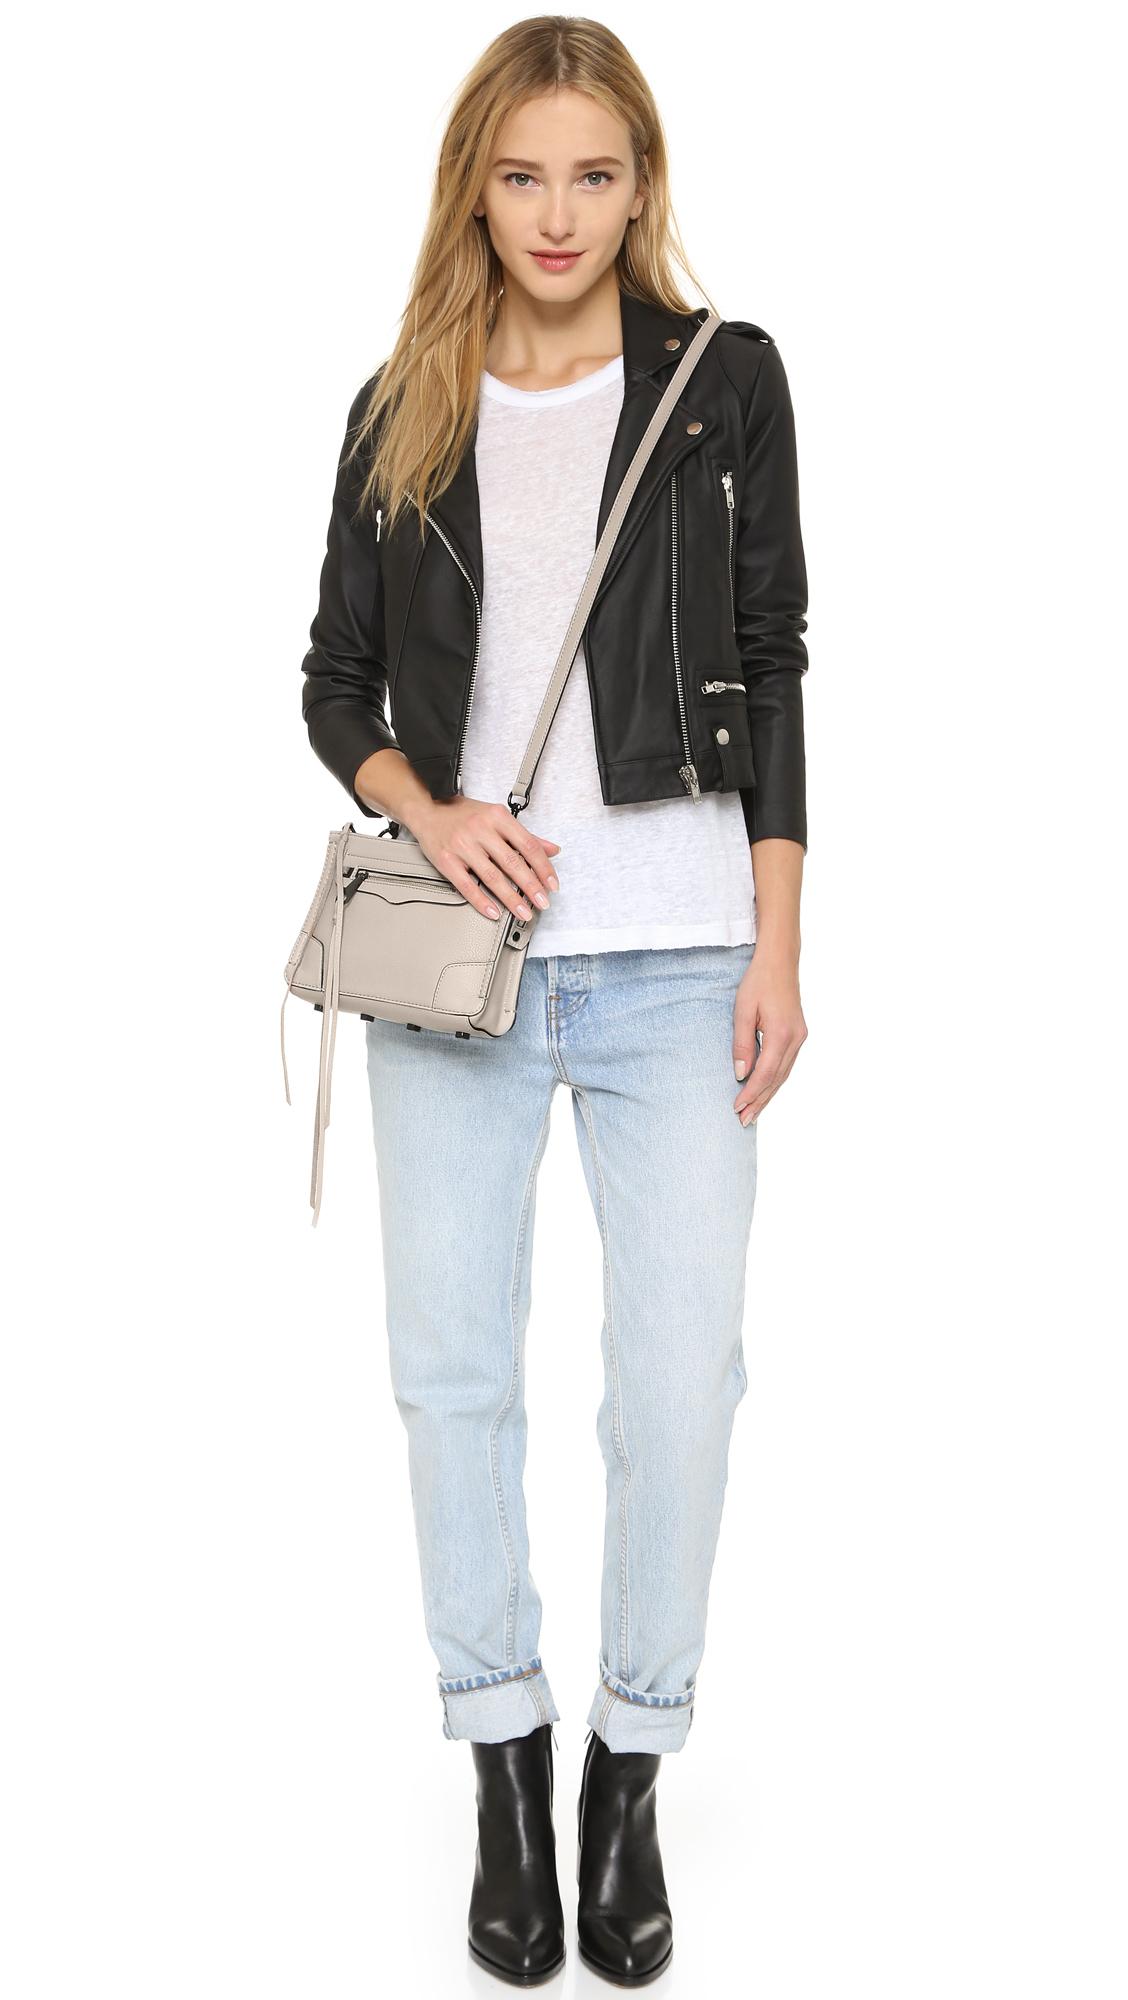 Rebecca Minkoff Regan Cross-Body Bag